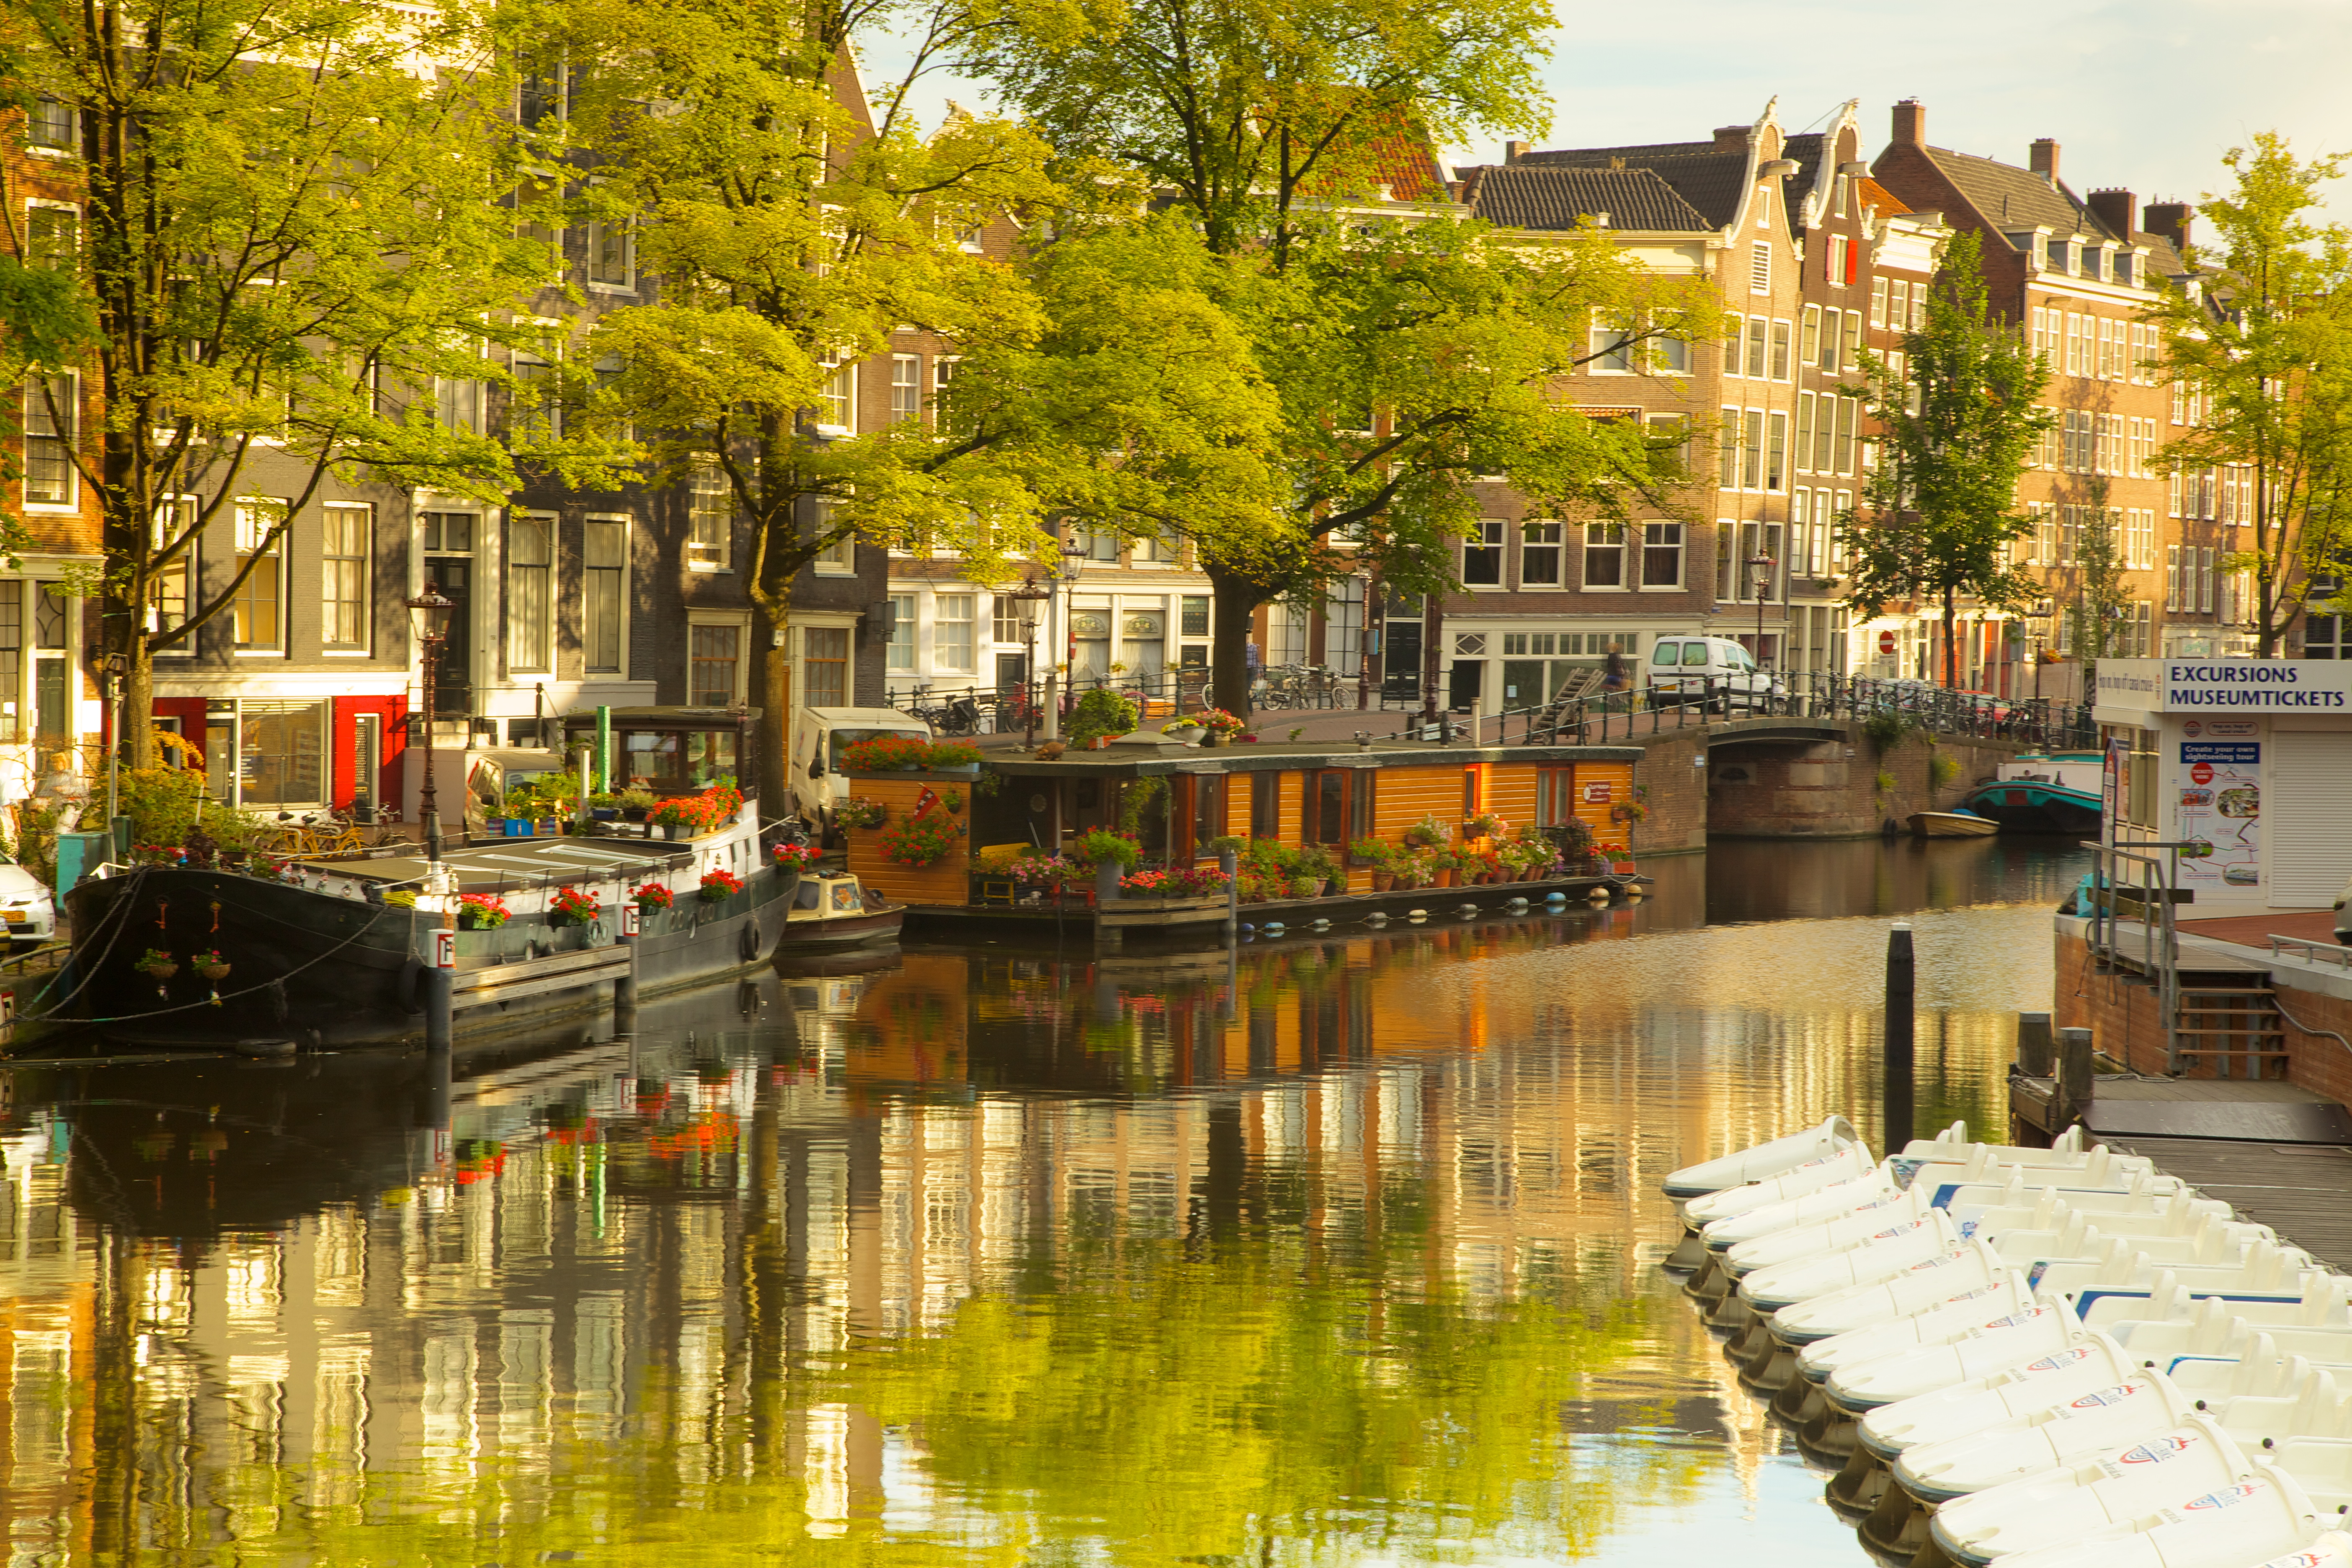 Imagebox_-_Amsterdam_Canal_-_2012_08_29_Amsterdam_104_%281%29.jpg?1548791628